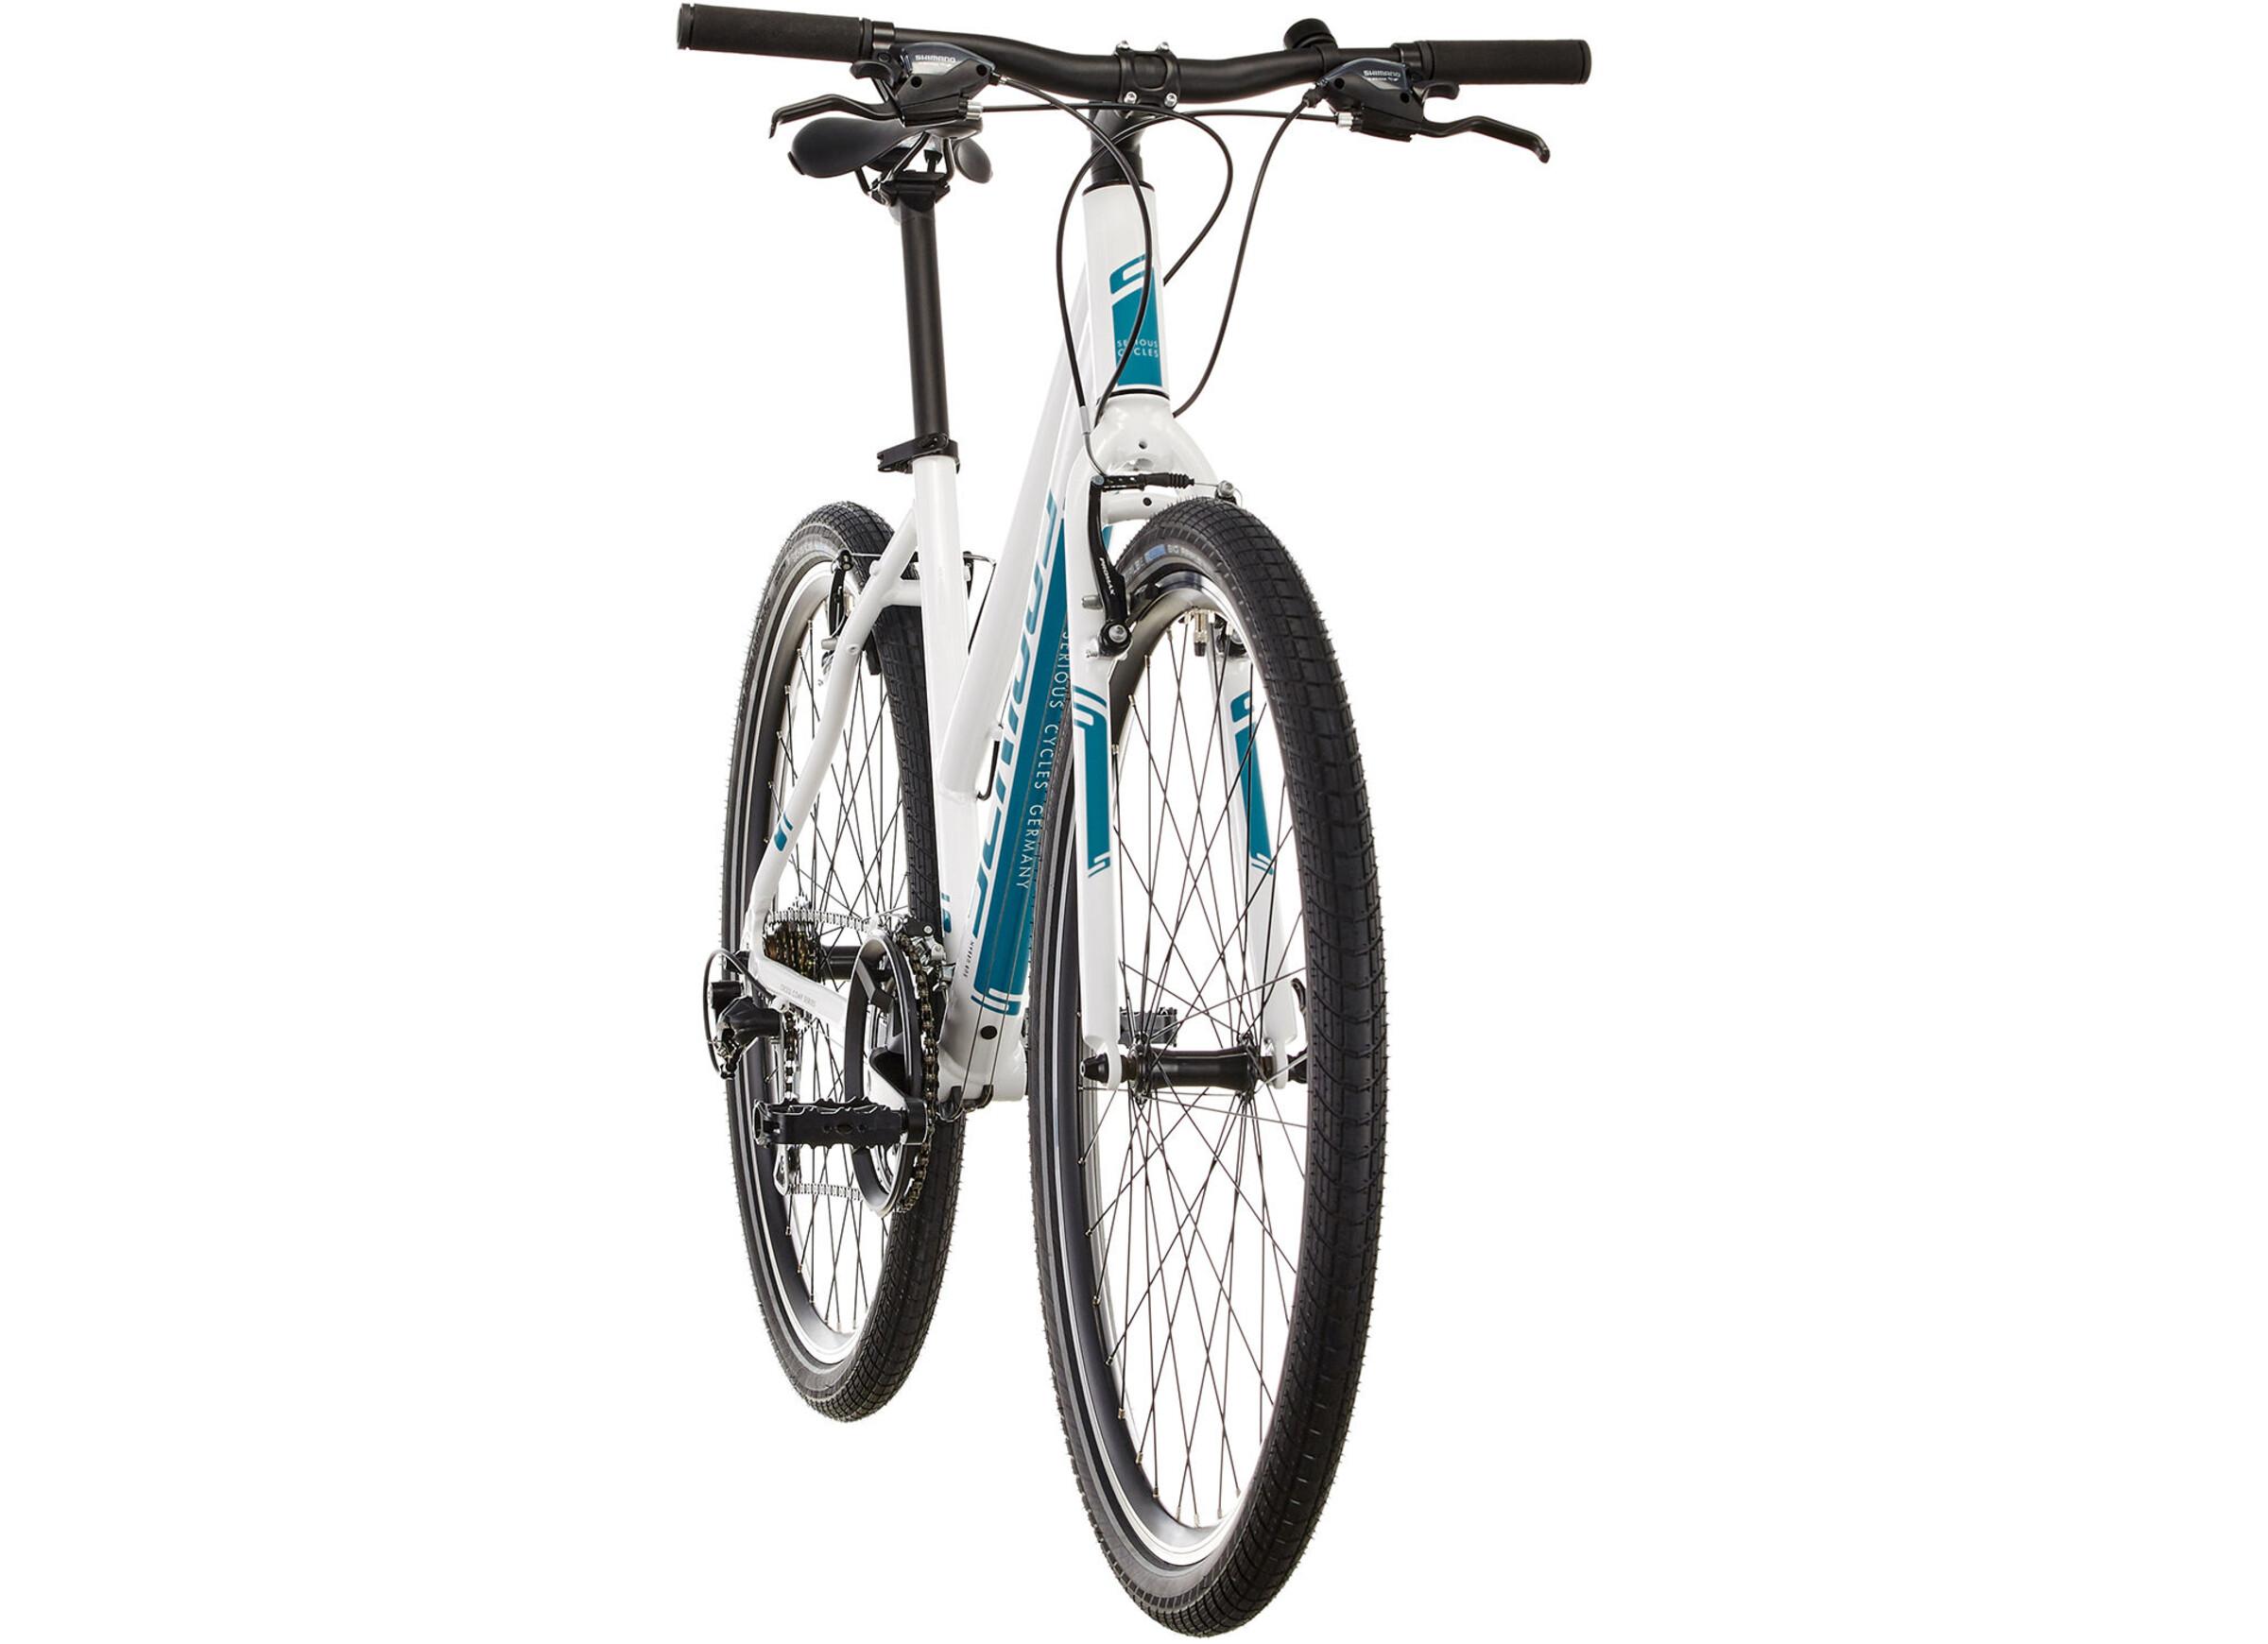 Serious bikes online shop Bikestercouk